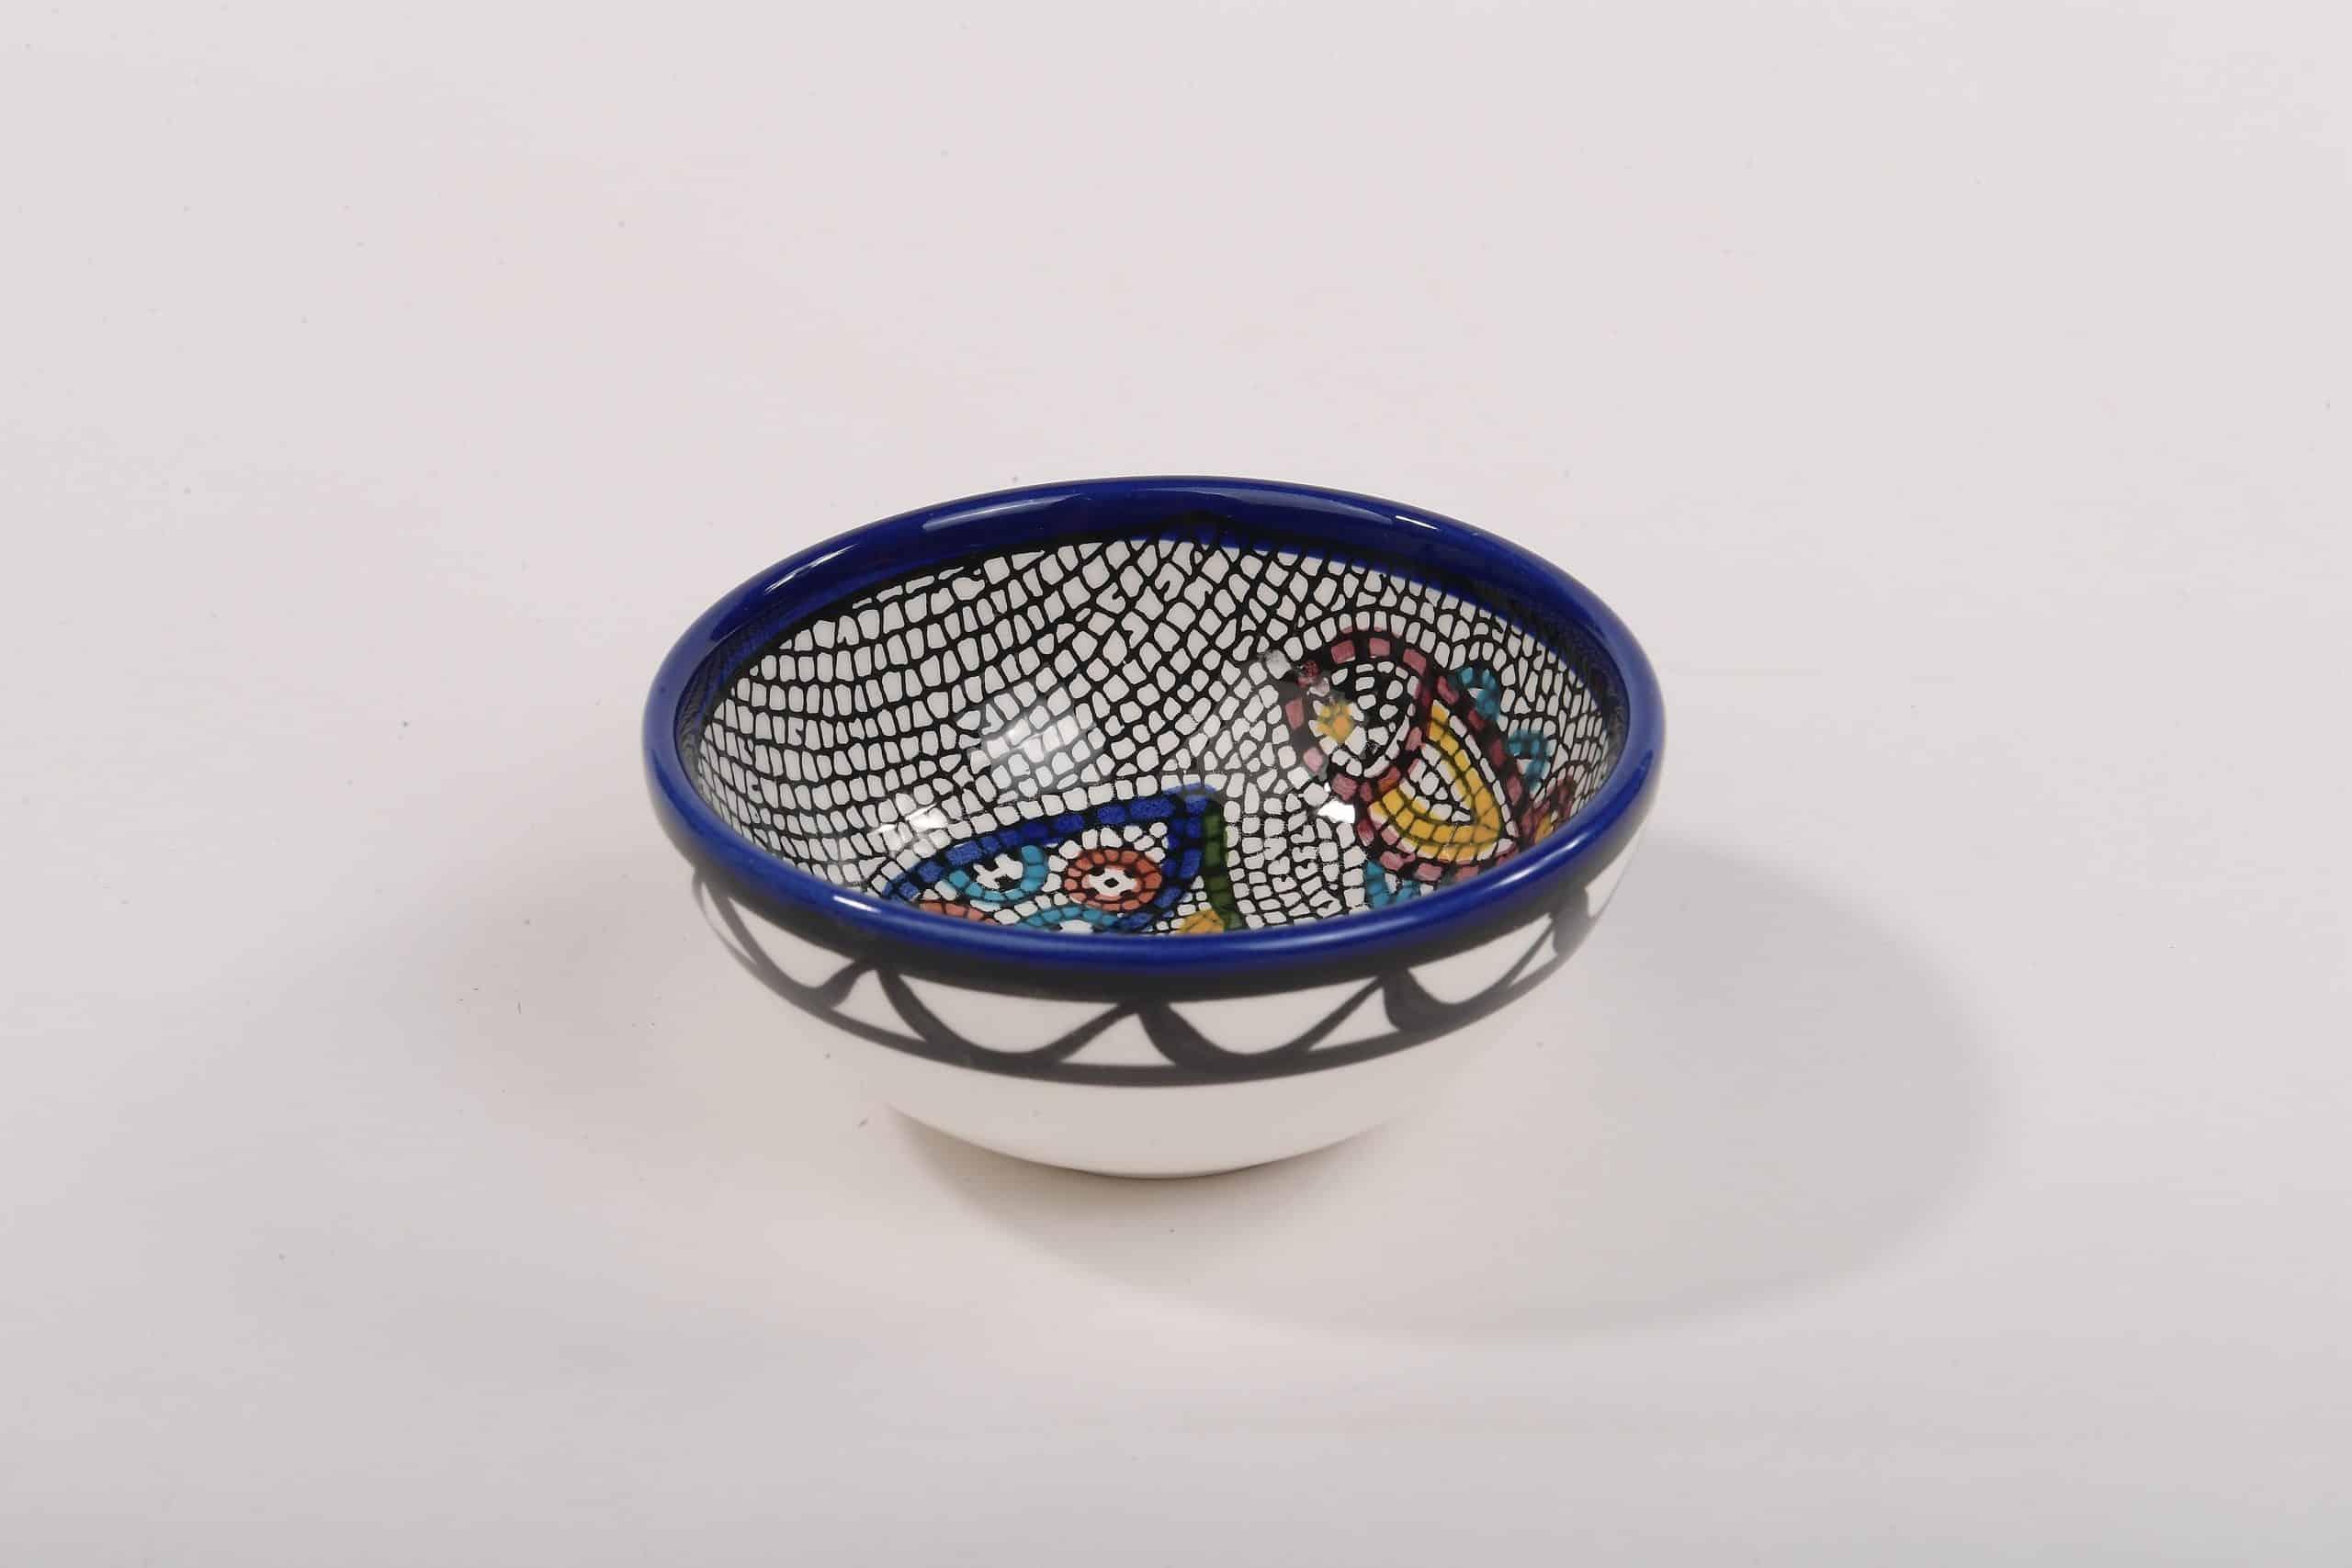 Armenian Ceramic Tabgha Mosaic Decorative Bowl 6 cm